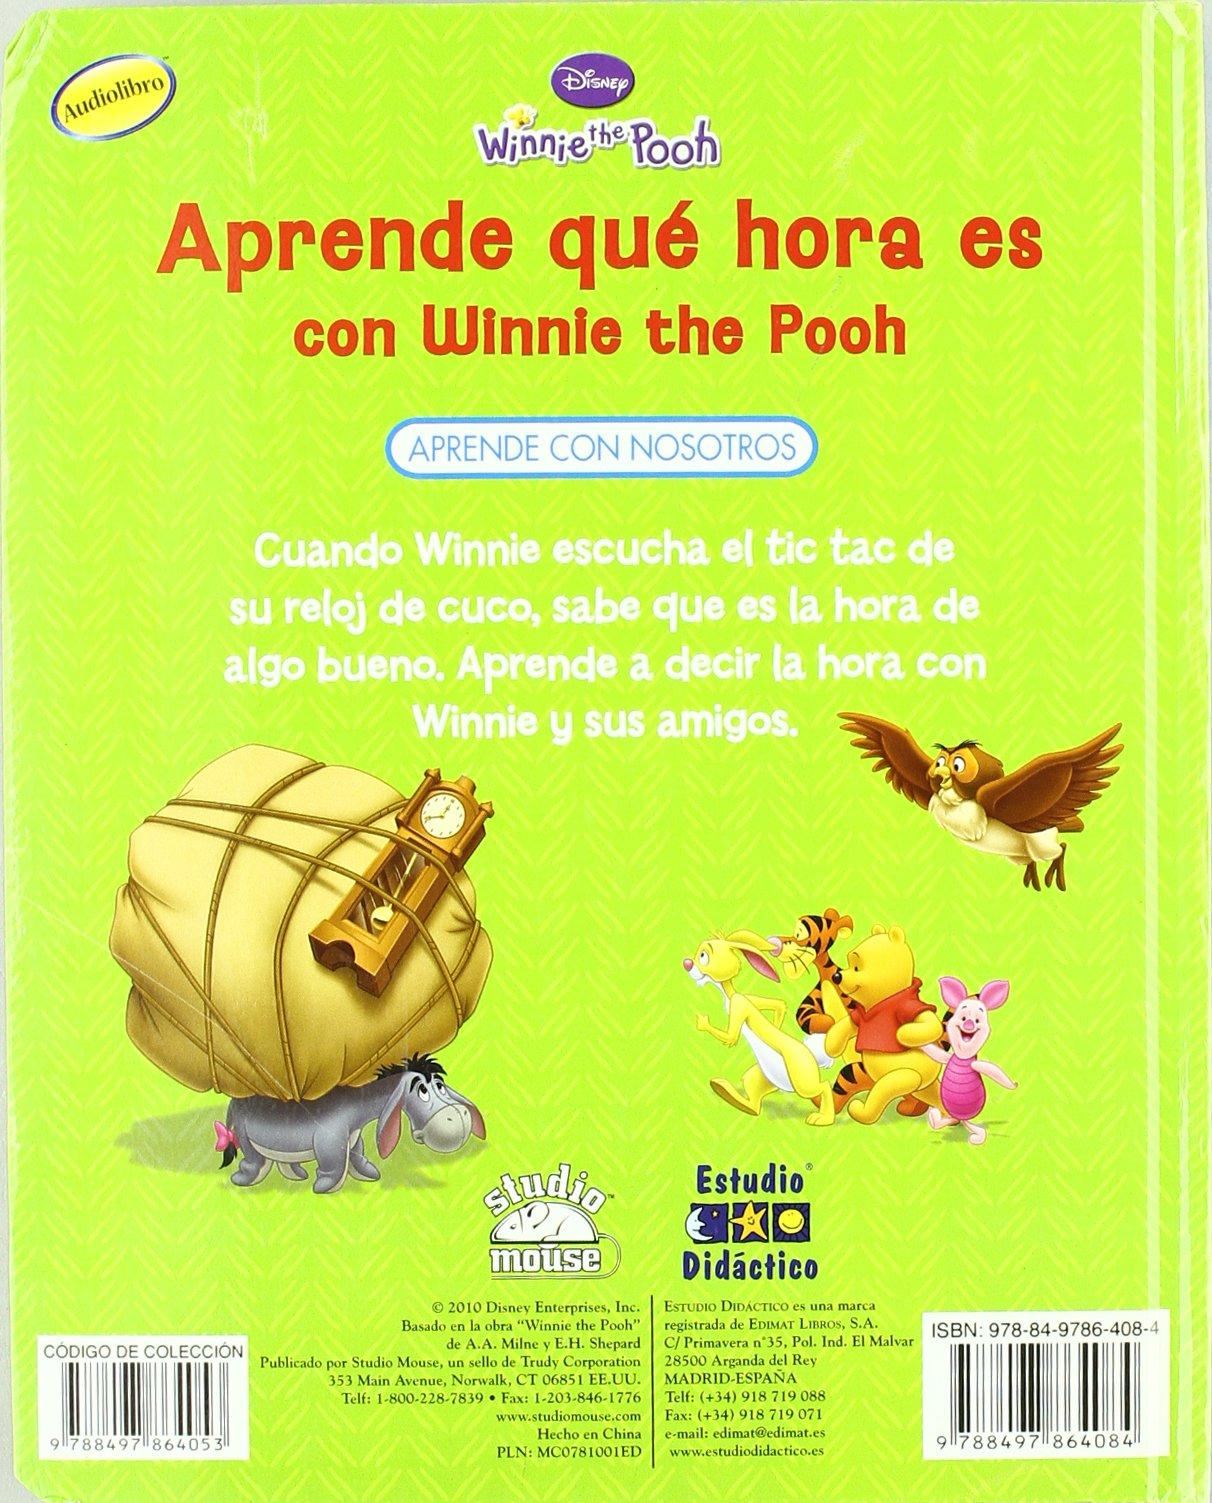 Aprende qu+ hora es con Winnie the Pooh: 9788497864084: Amazon.com: Books